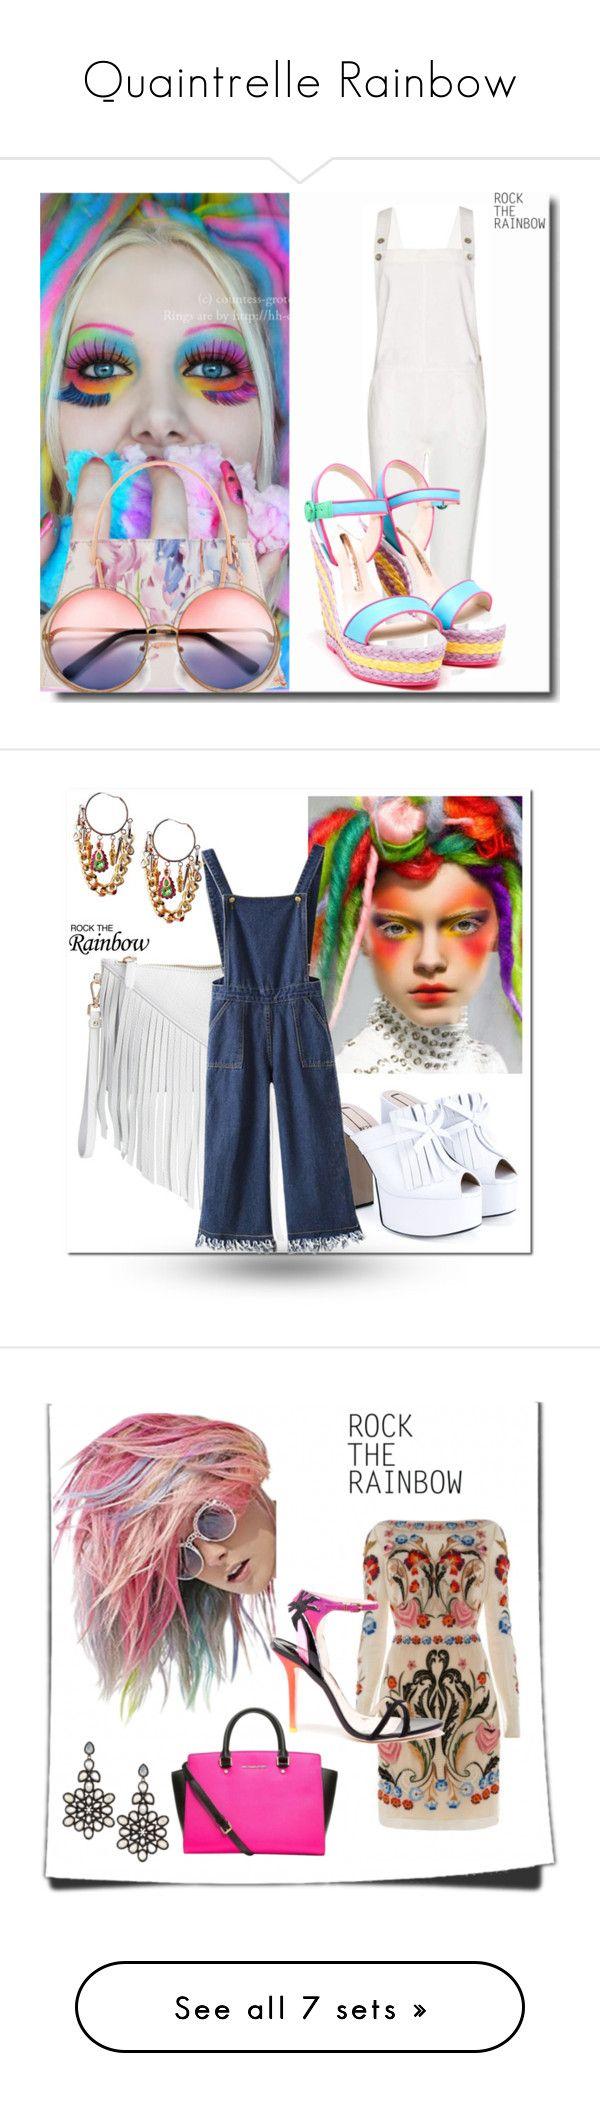 """Quaintrelle Rainbow"" by bibiantje-m on Polyvore featuring schoonheid en mode"